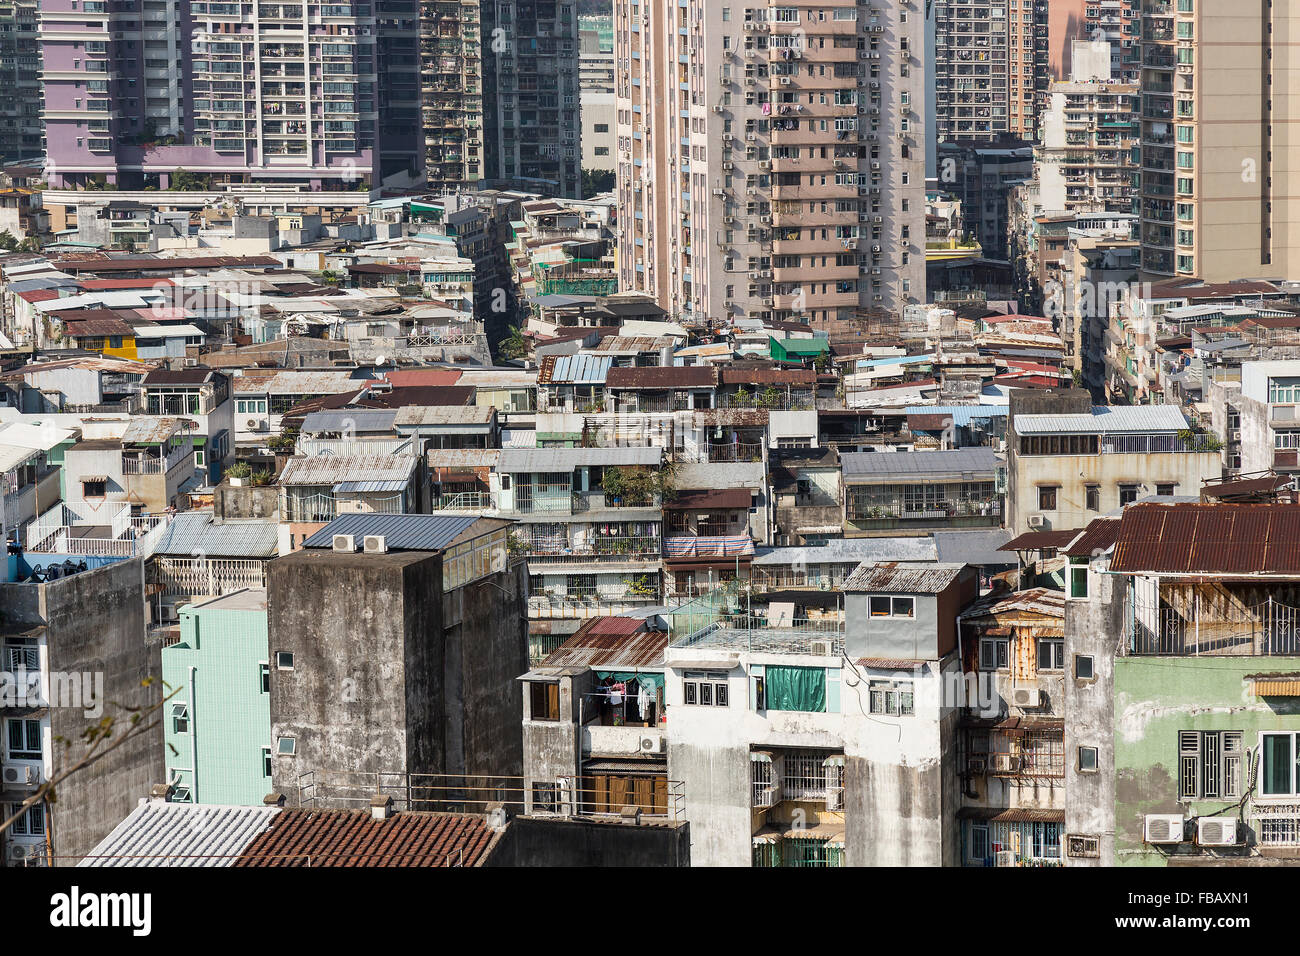 Arquitectura de Macao, China. Imagen De Stock